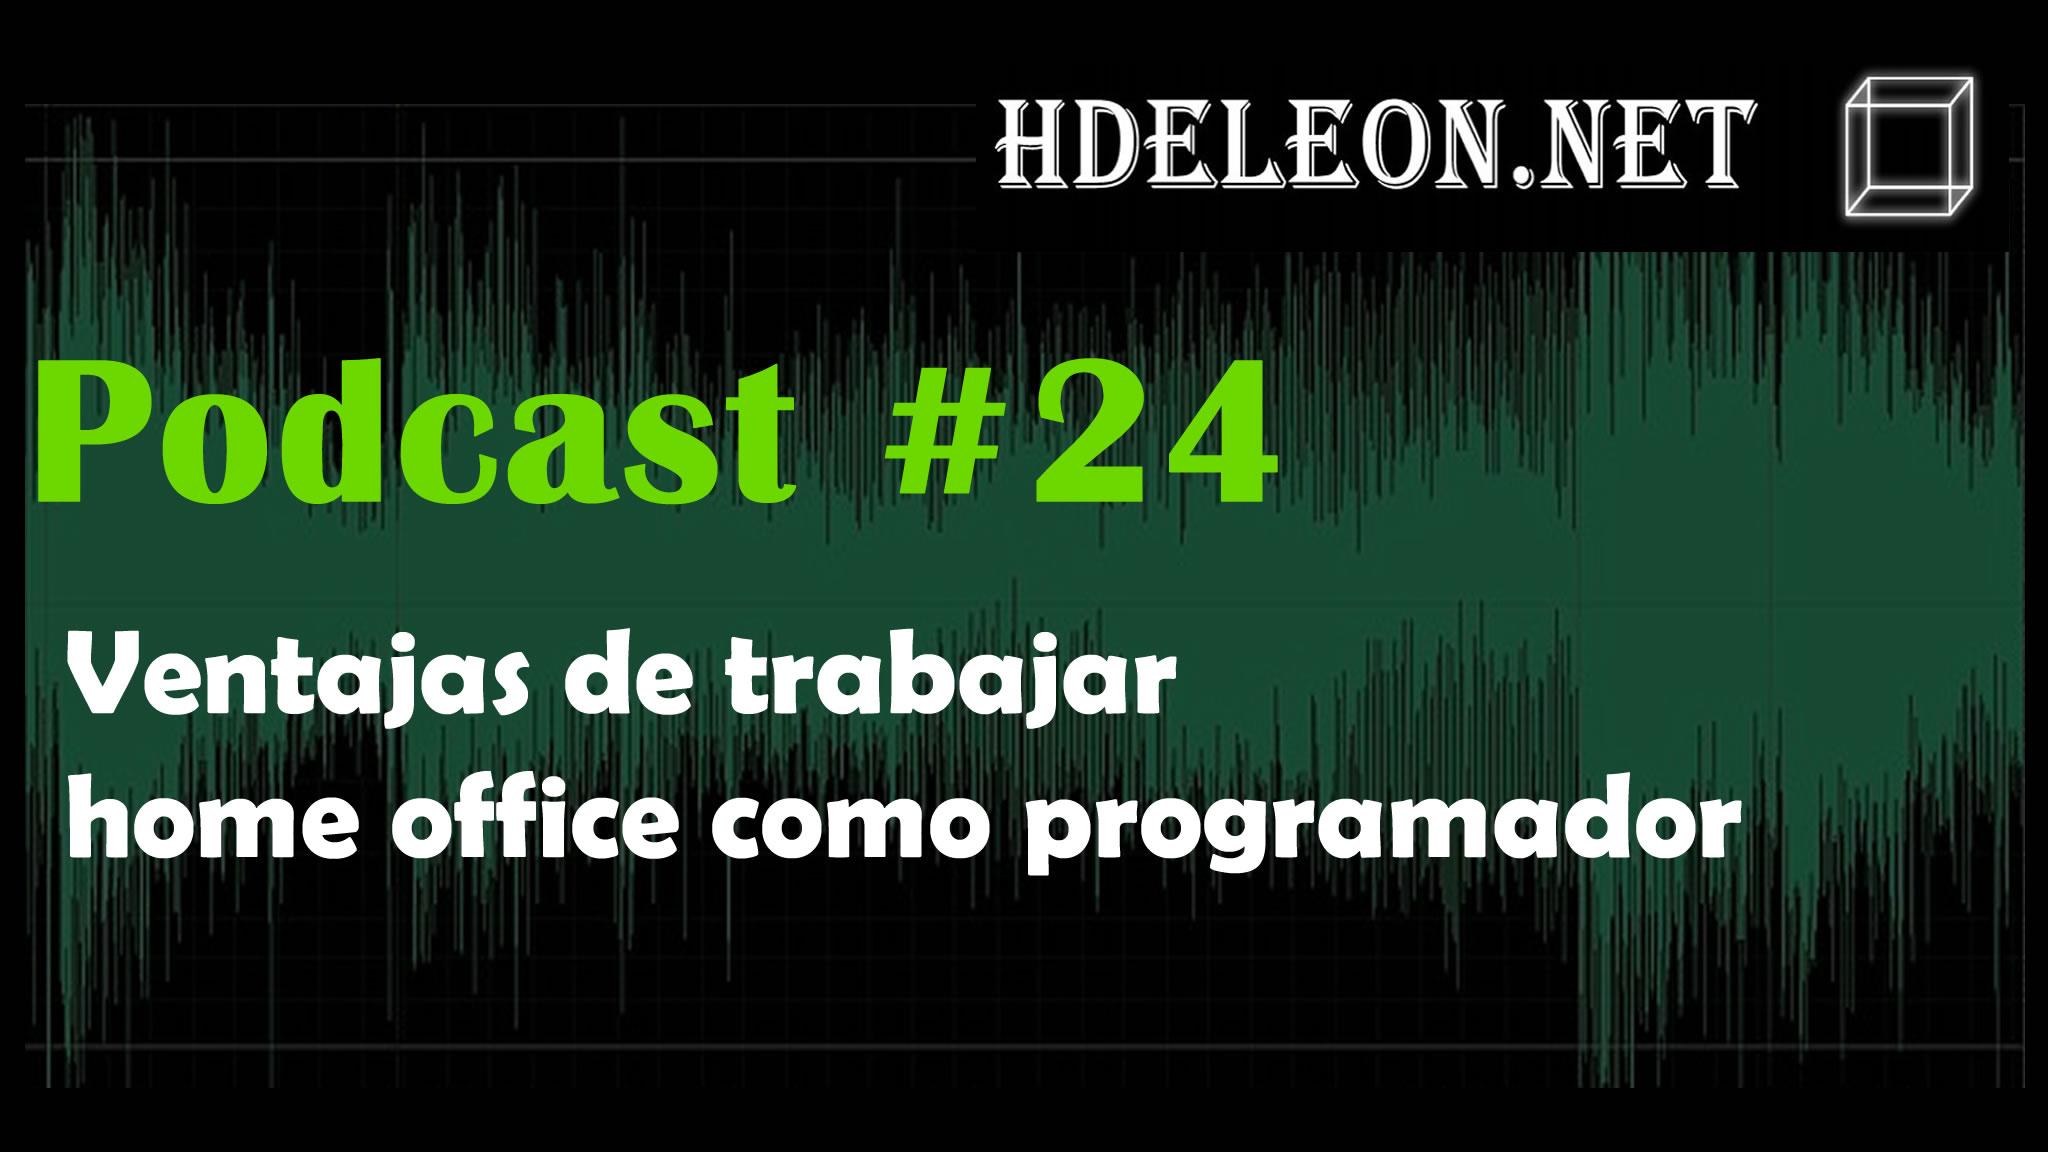 Podcast #24 – Ventajas de trabajar home office como programador